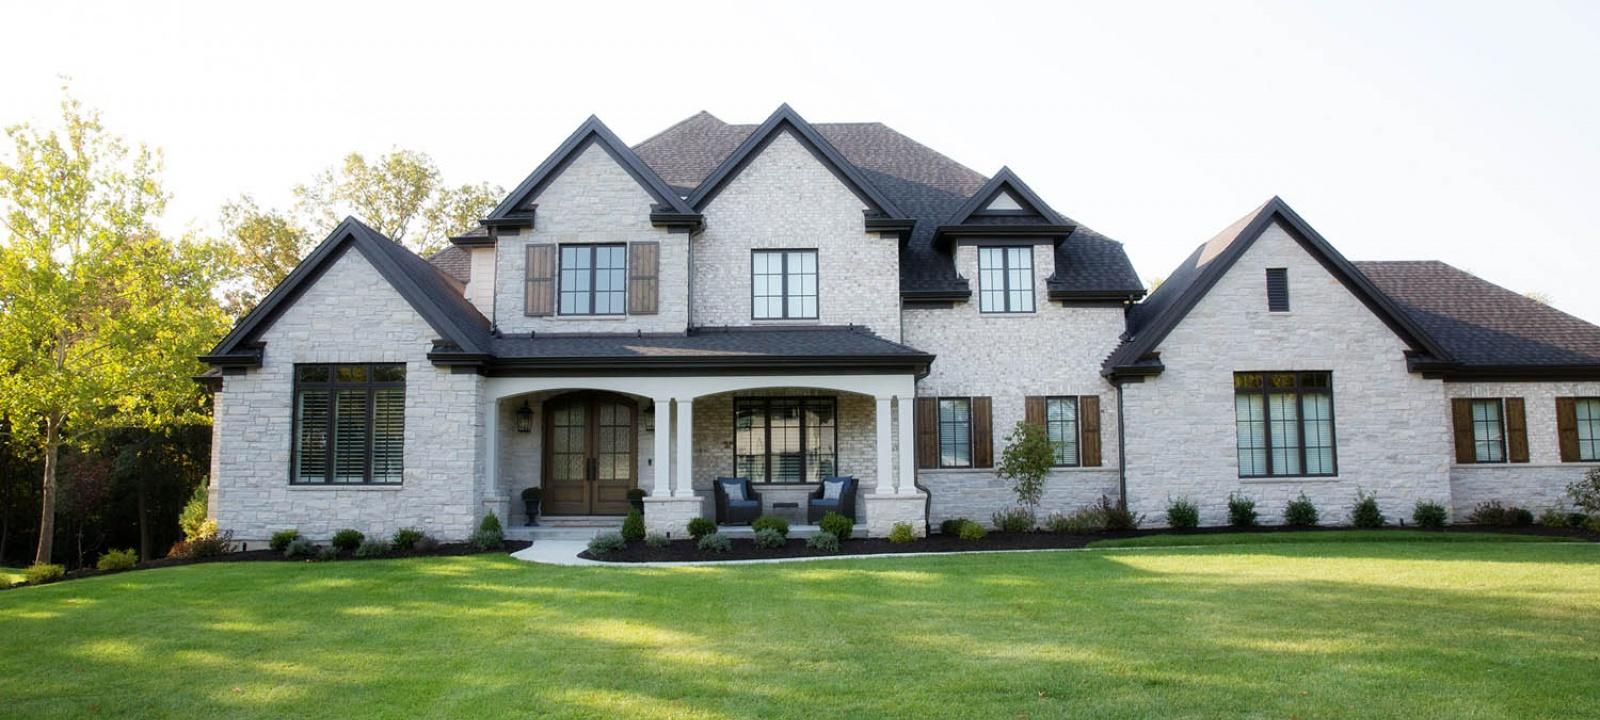 32 Meadowbrook Country Club Estates, Ballwin, Missouri 63011, 5 Bedrooms Bedrooms, ,4 BathroomsBathrooms,House,Under Construction,Meadowbrook Country Club Estates,1002